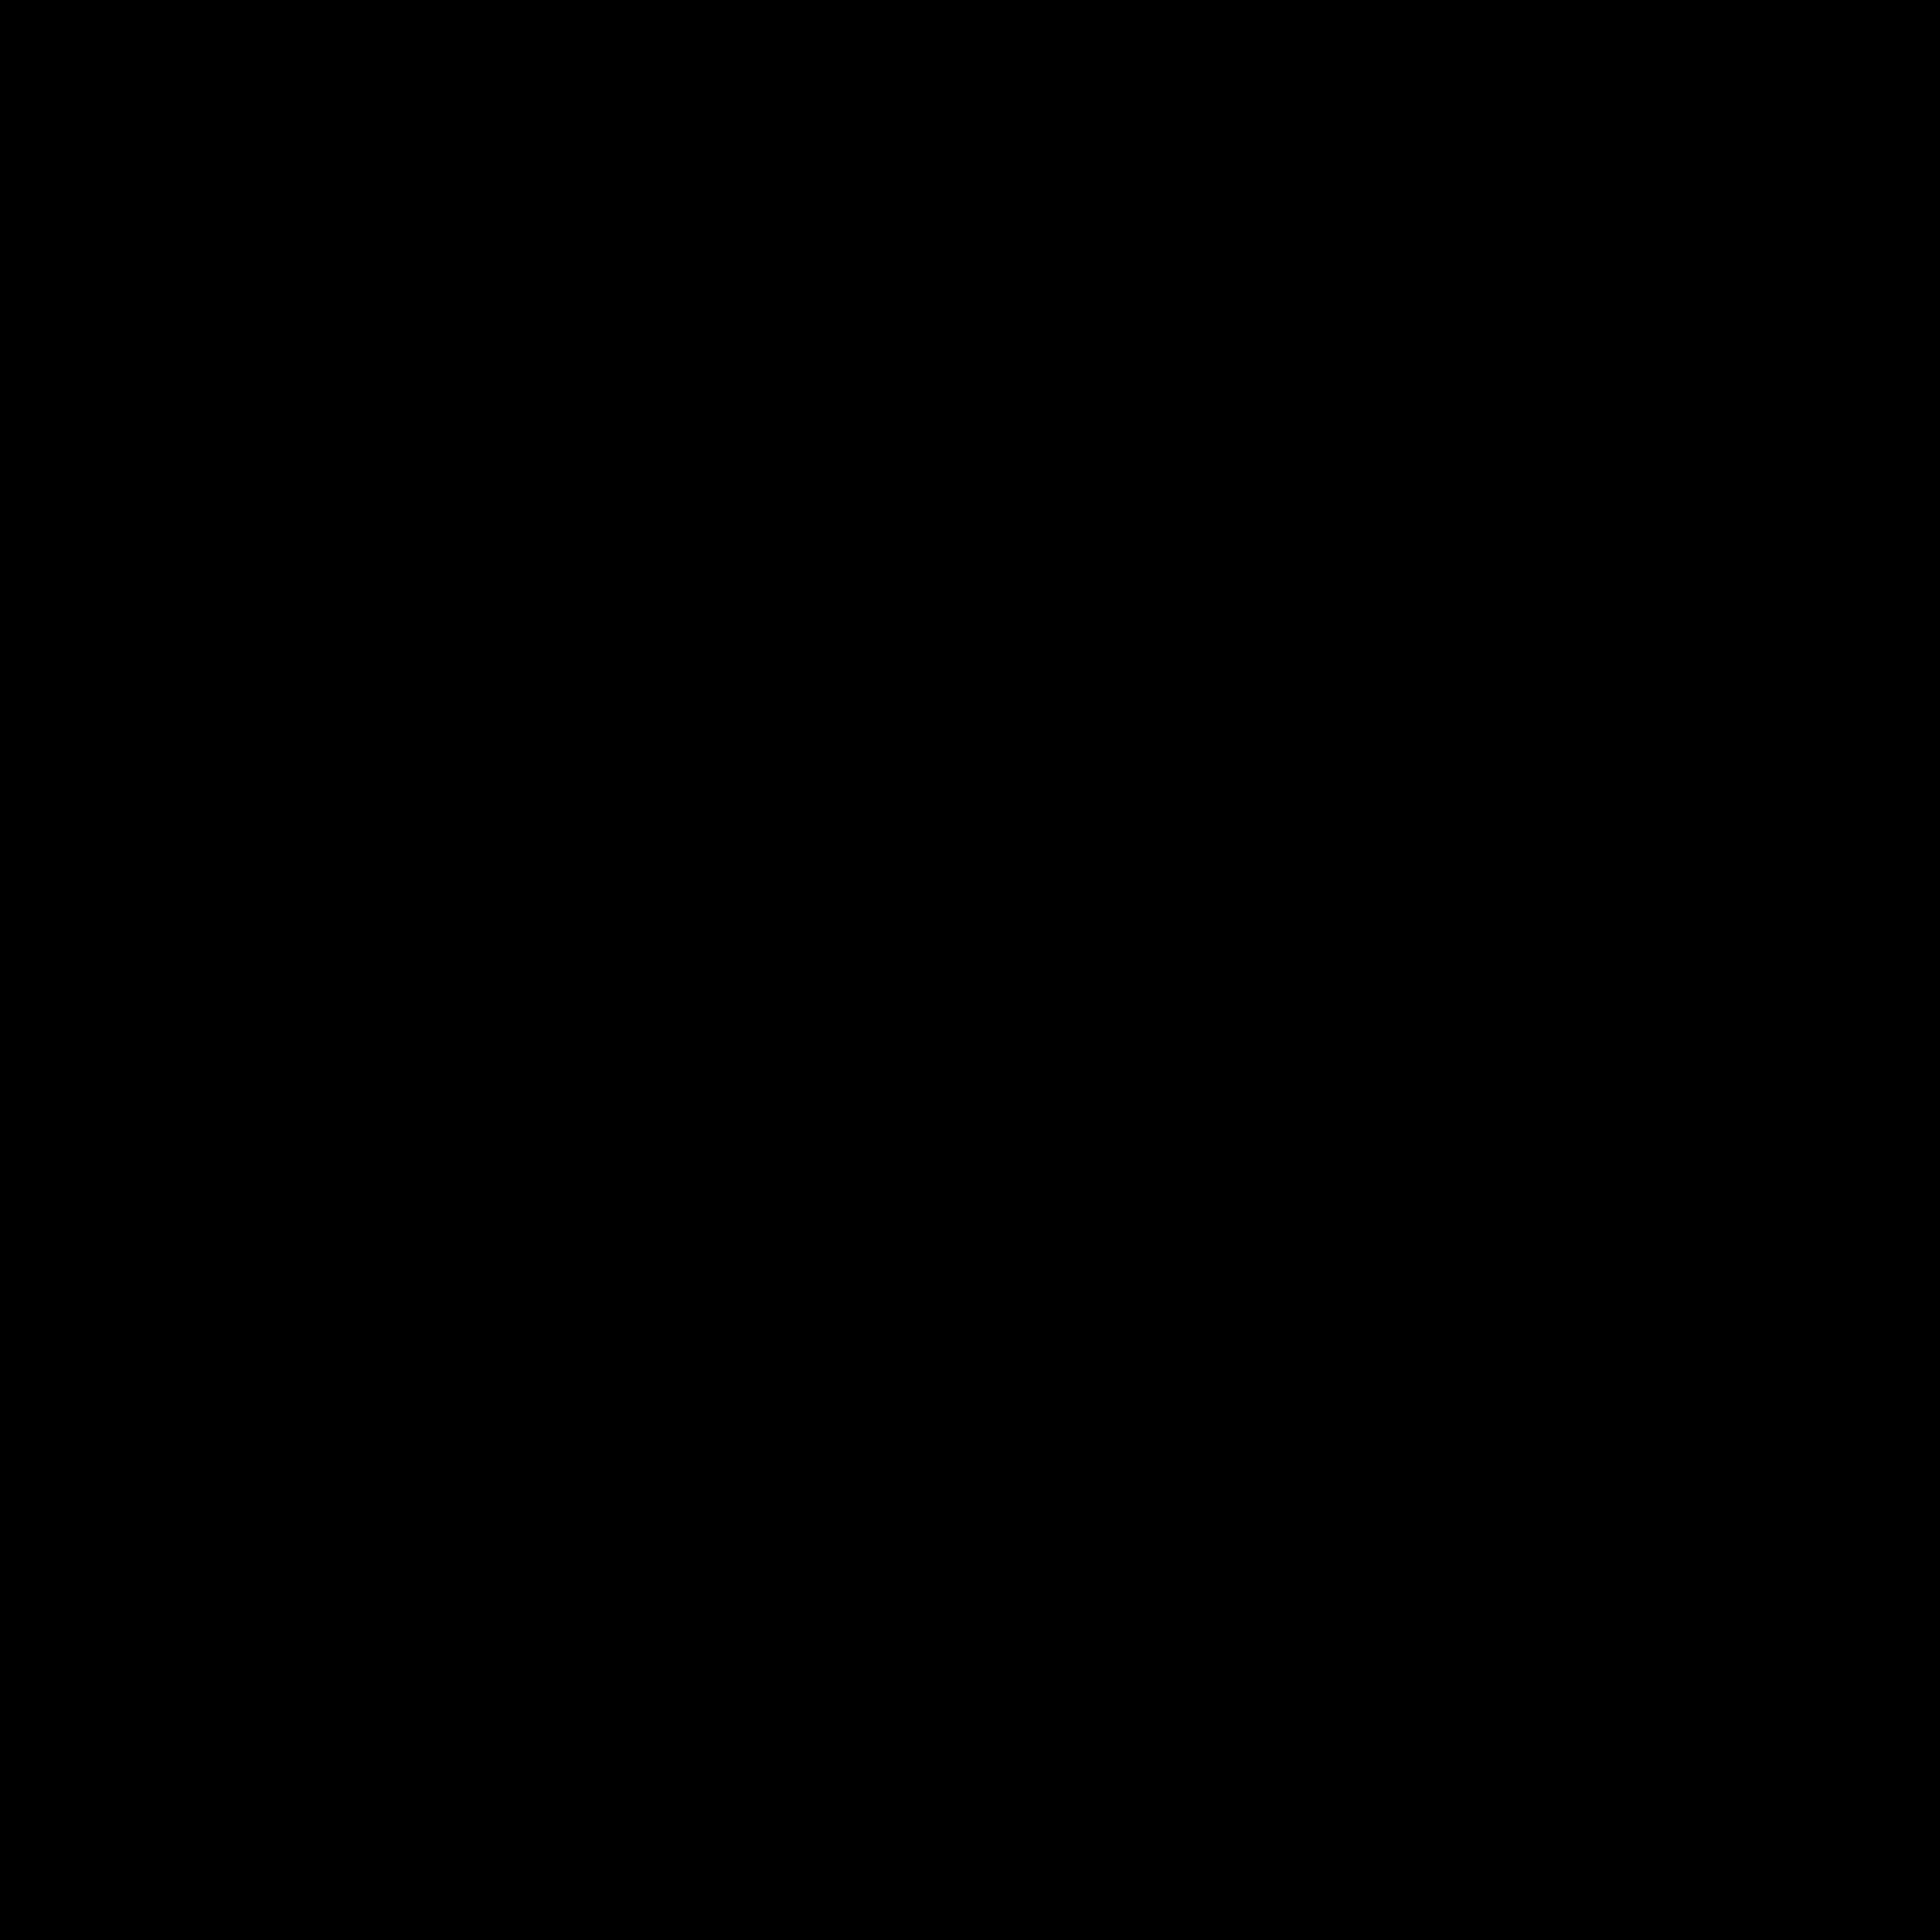 AFS 4466 Logo PNG Transparent & SVG Vector.